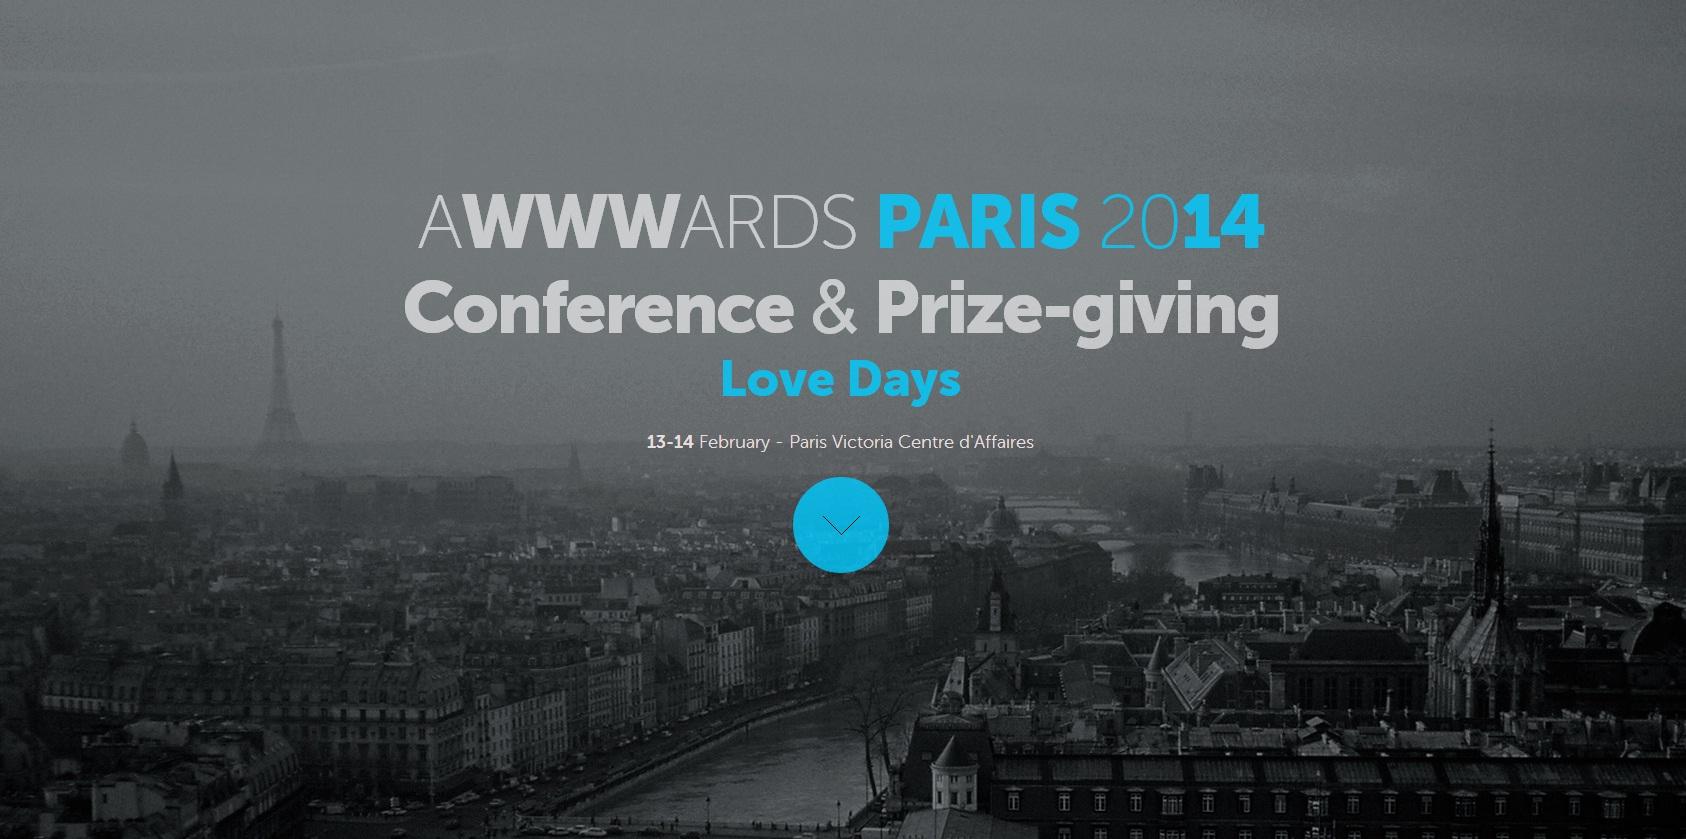 awwards conference